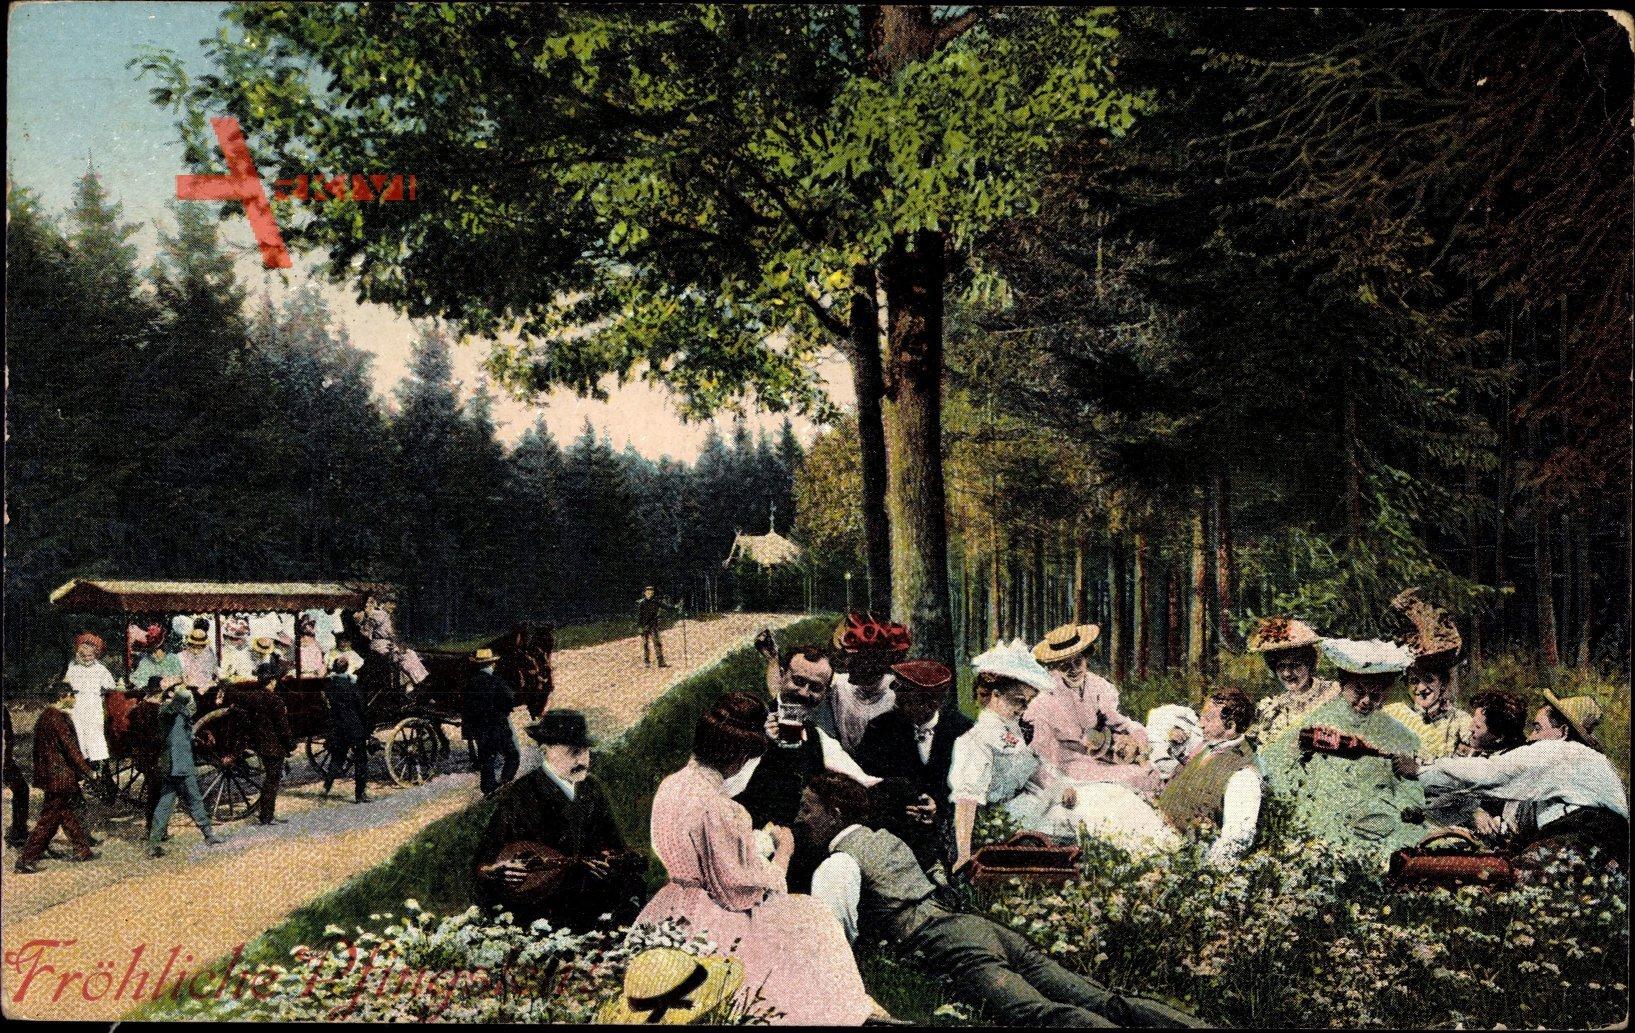 Glückwunsch Pfingsten, Spaziergänger im Wald, Picknick